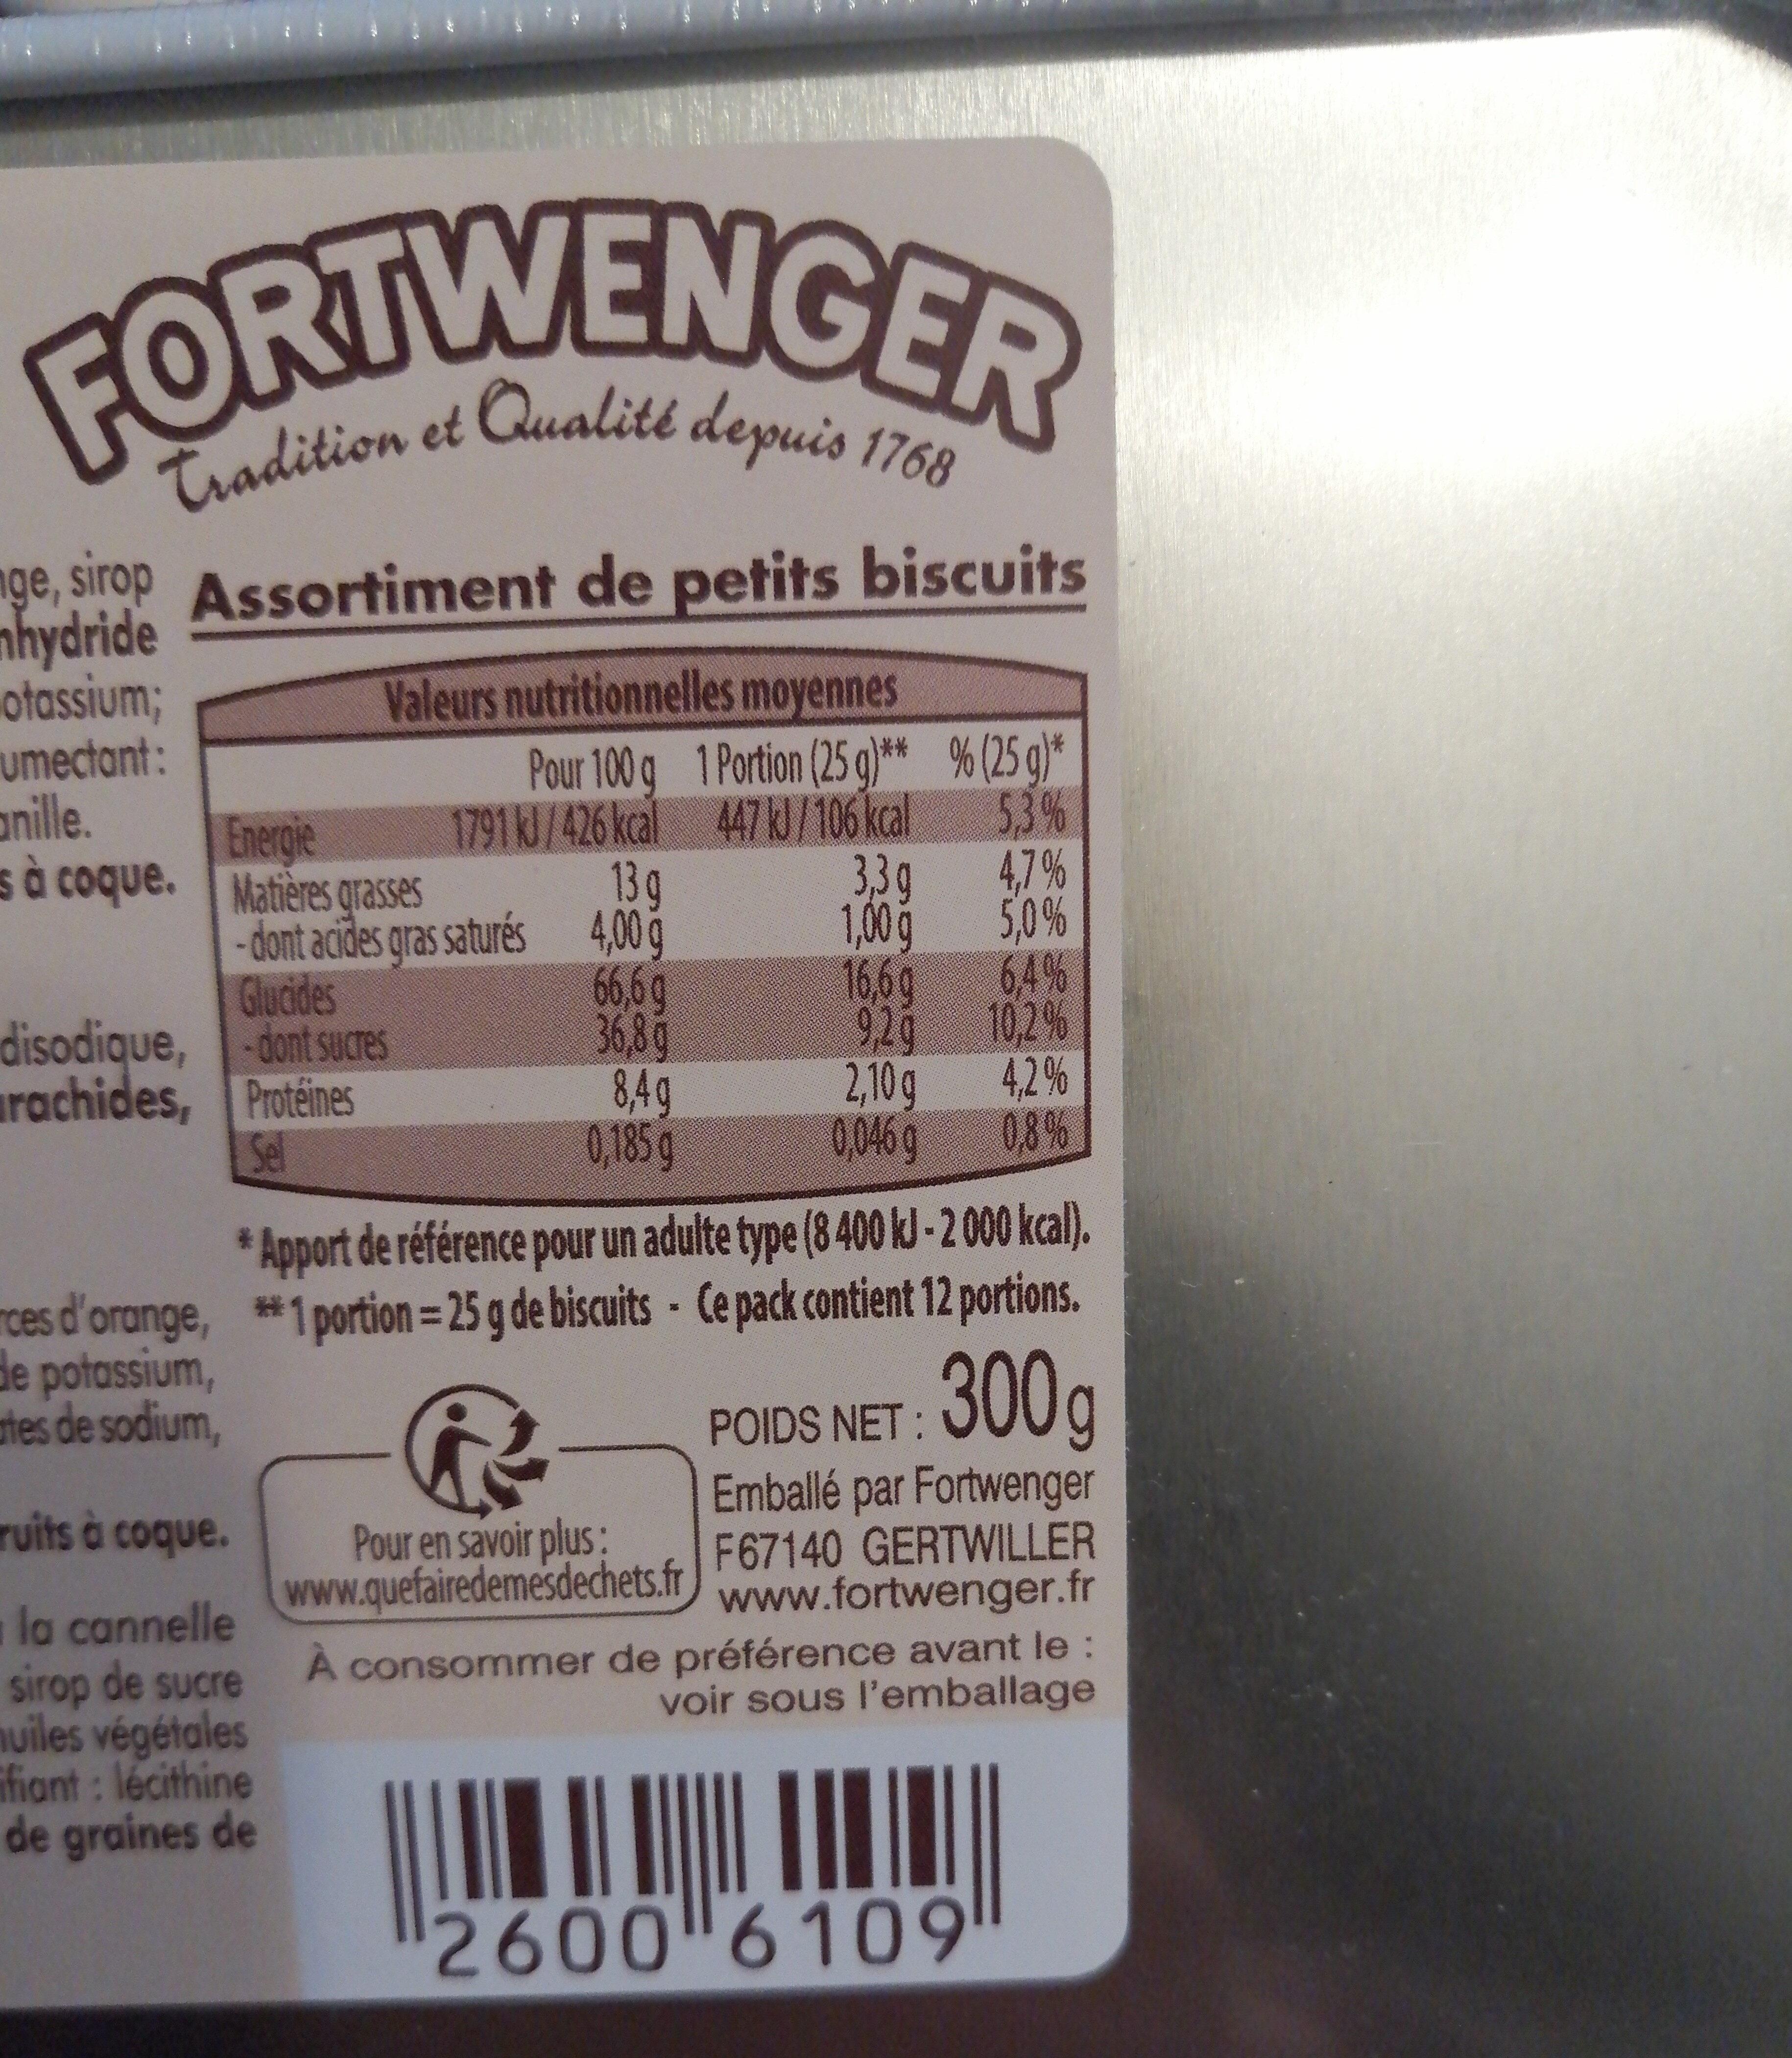 Assortiment de petits biscuits - Valori nutrizionali - fr